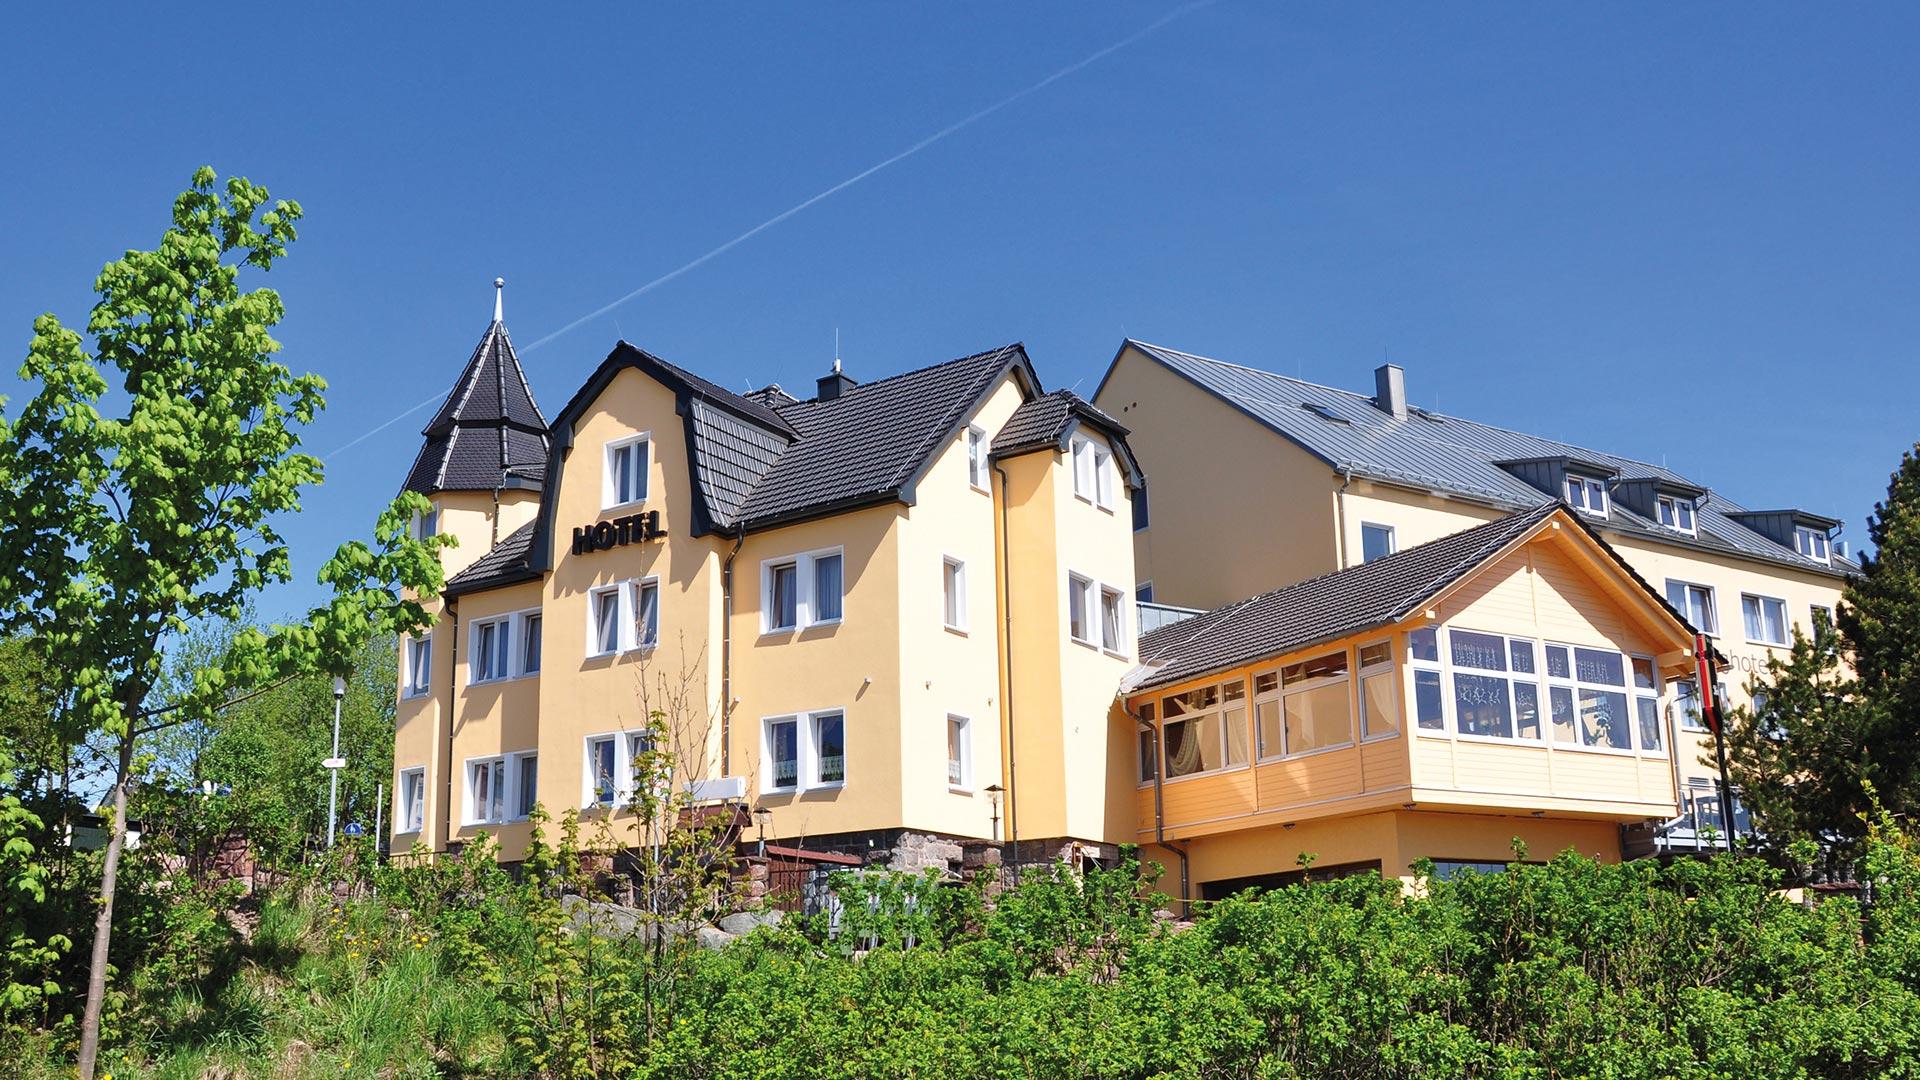 Schlossberghotel Oberhof Blick von aussen